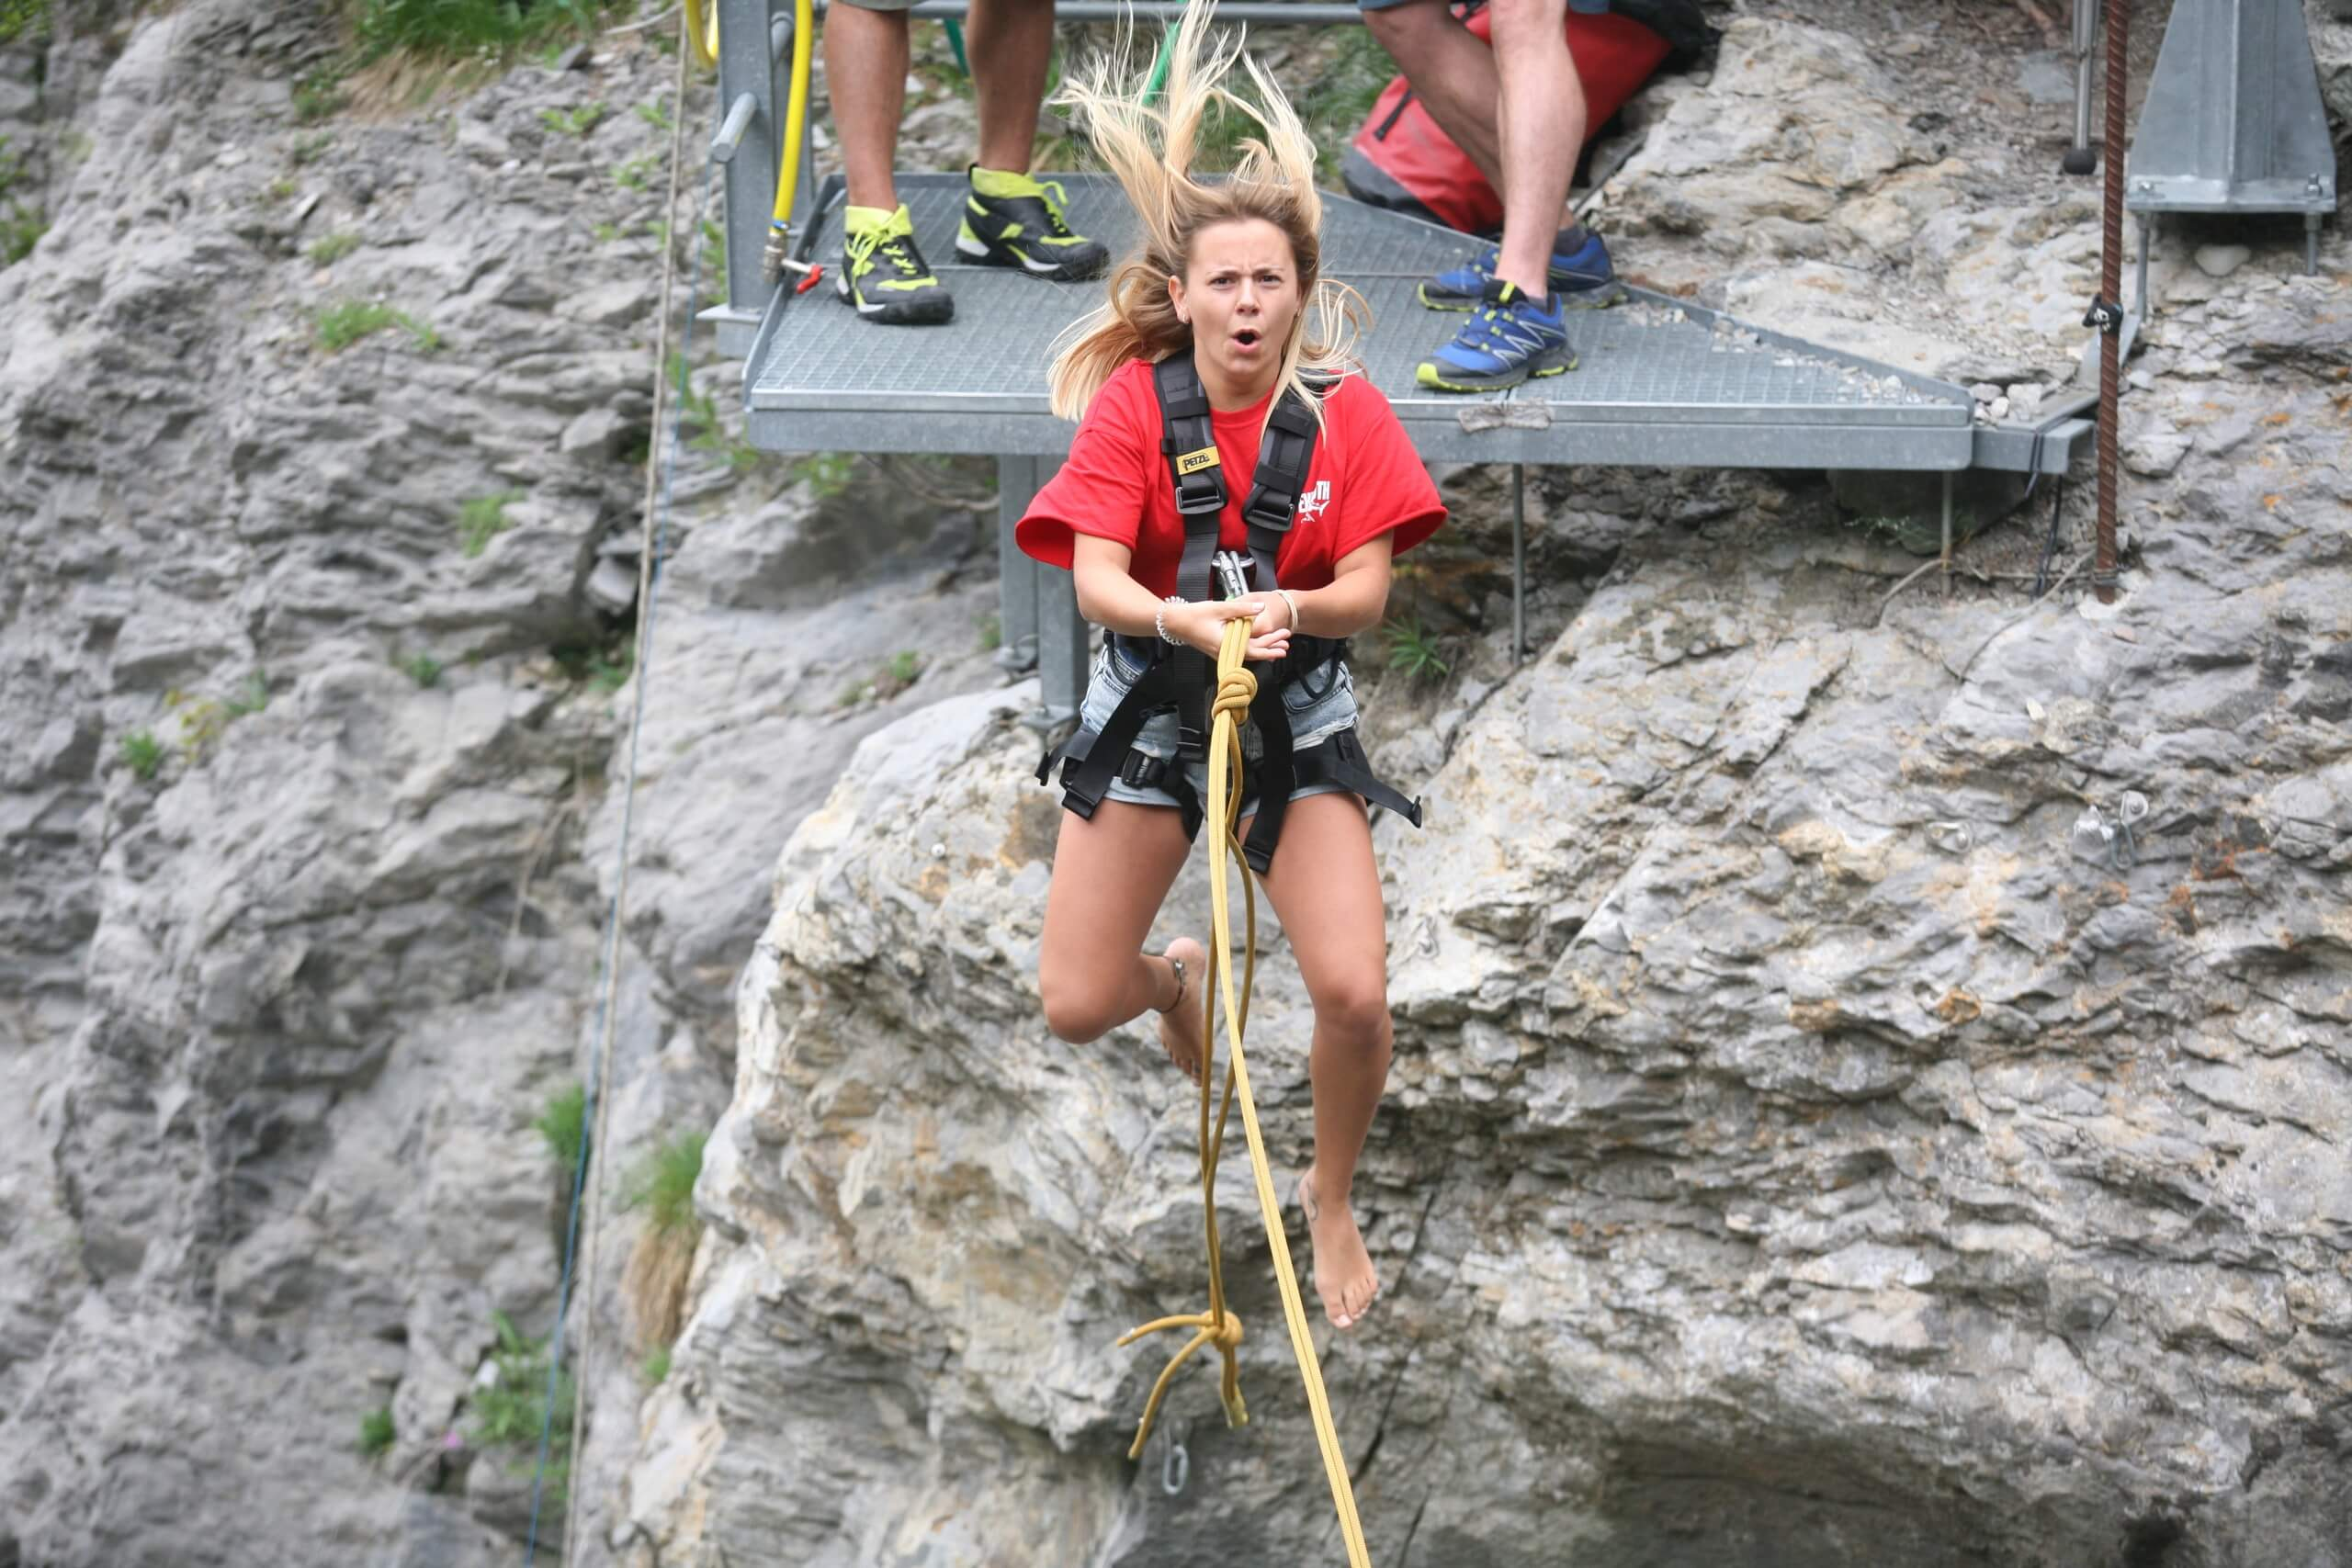 grindelwald-glacier-canyon-swing-felswand-adrenalin